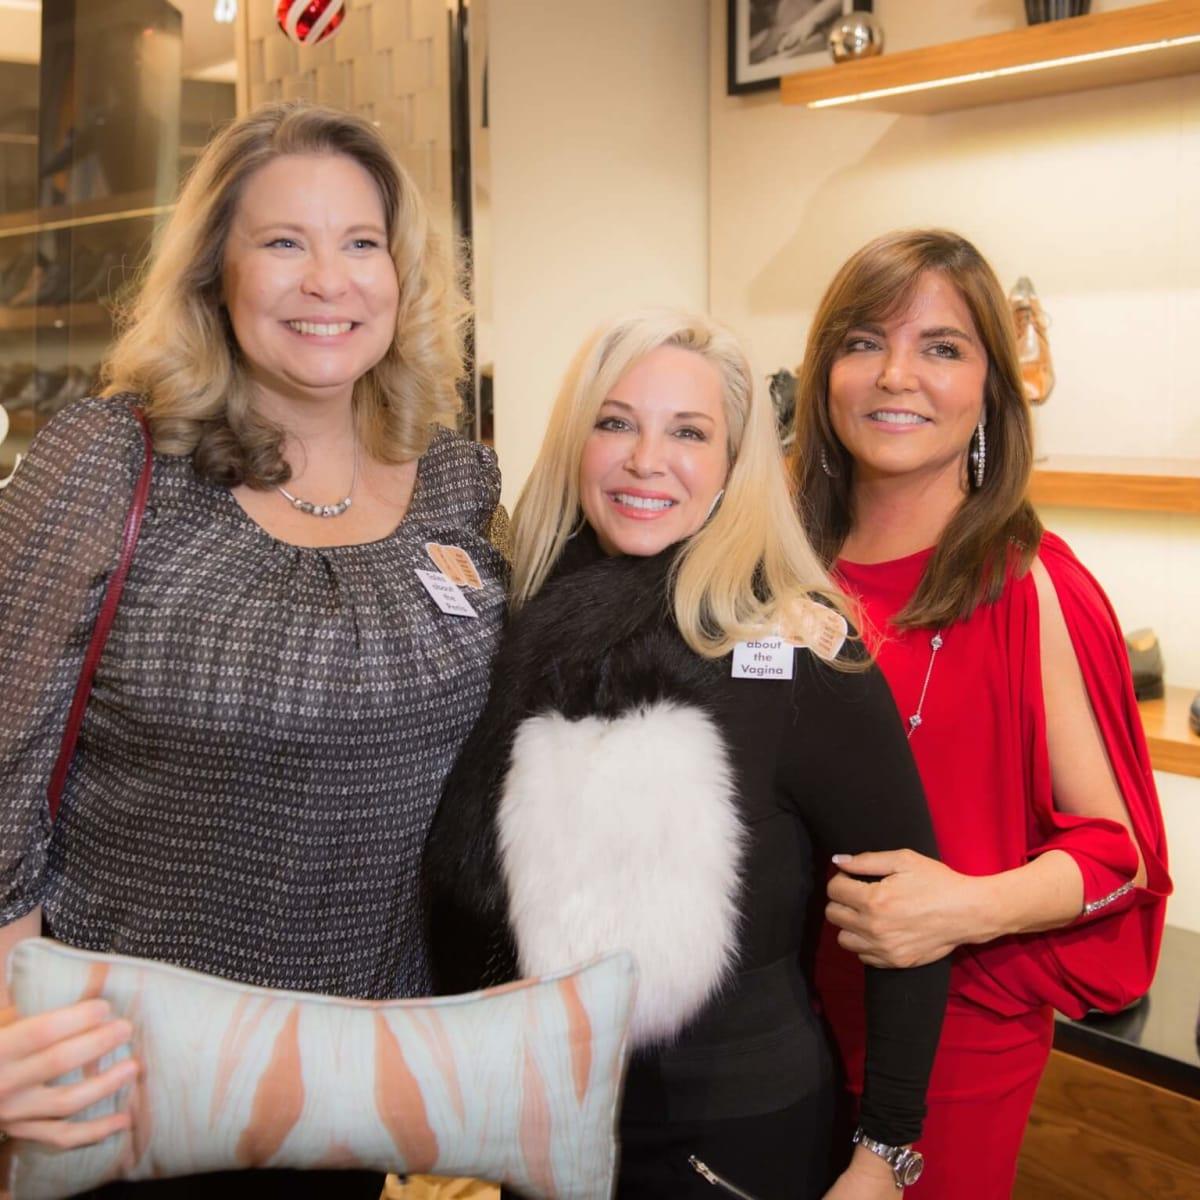 Cancer Below the Belt fundraiser, Dottie Bourassa, Dawn Herring Gunther, Beth Cassidy